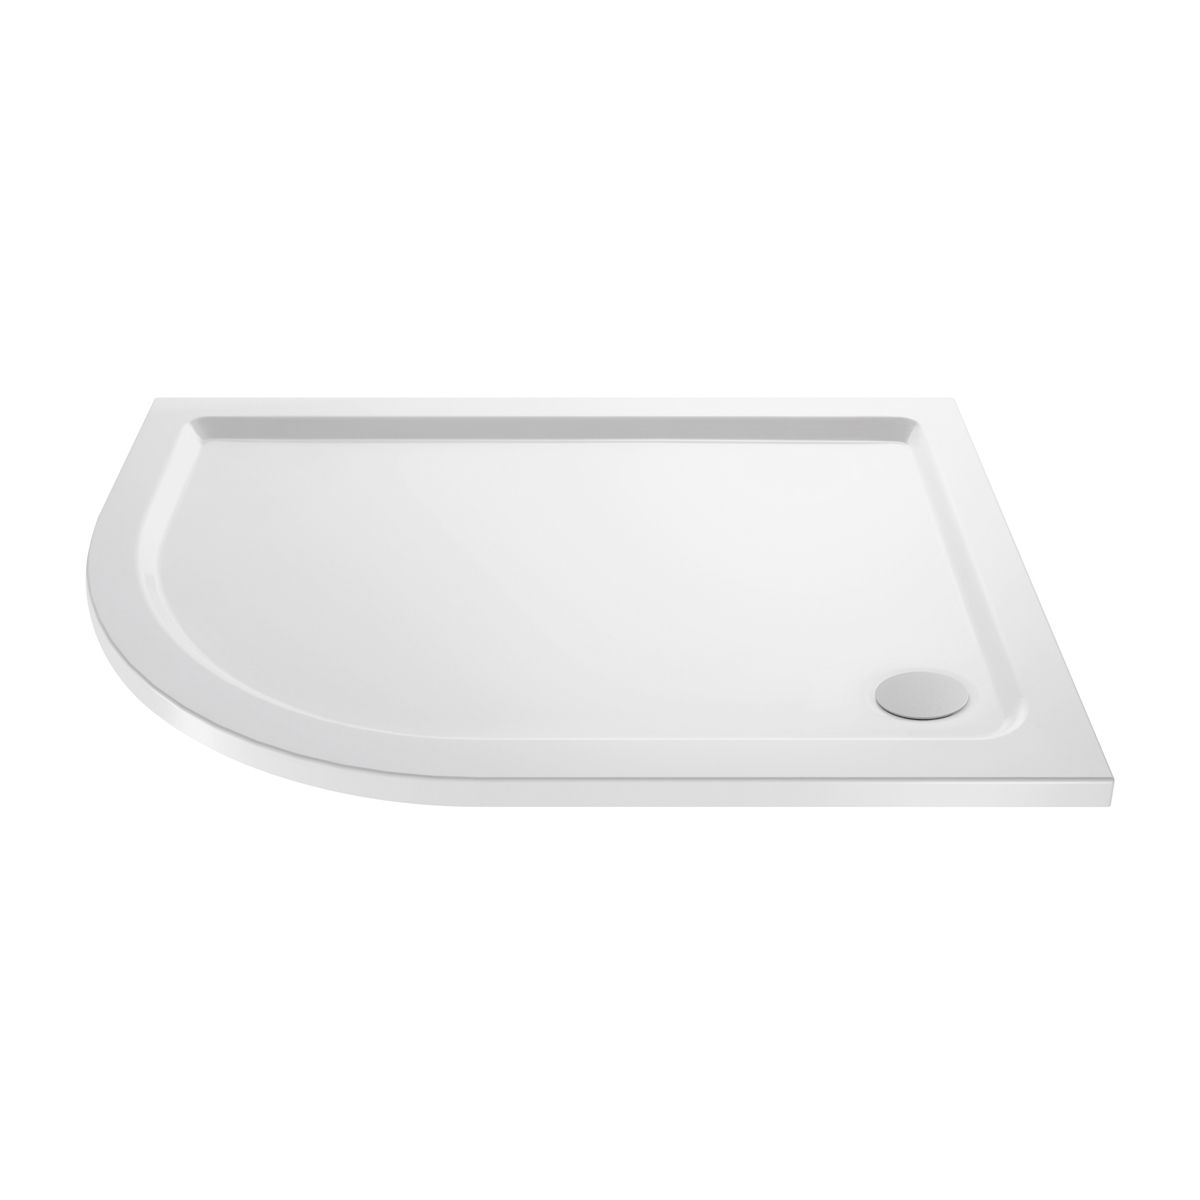 Cassellie Offset Quadrant Shower Tray 1000 x 800mm Left Handed